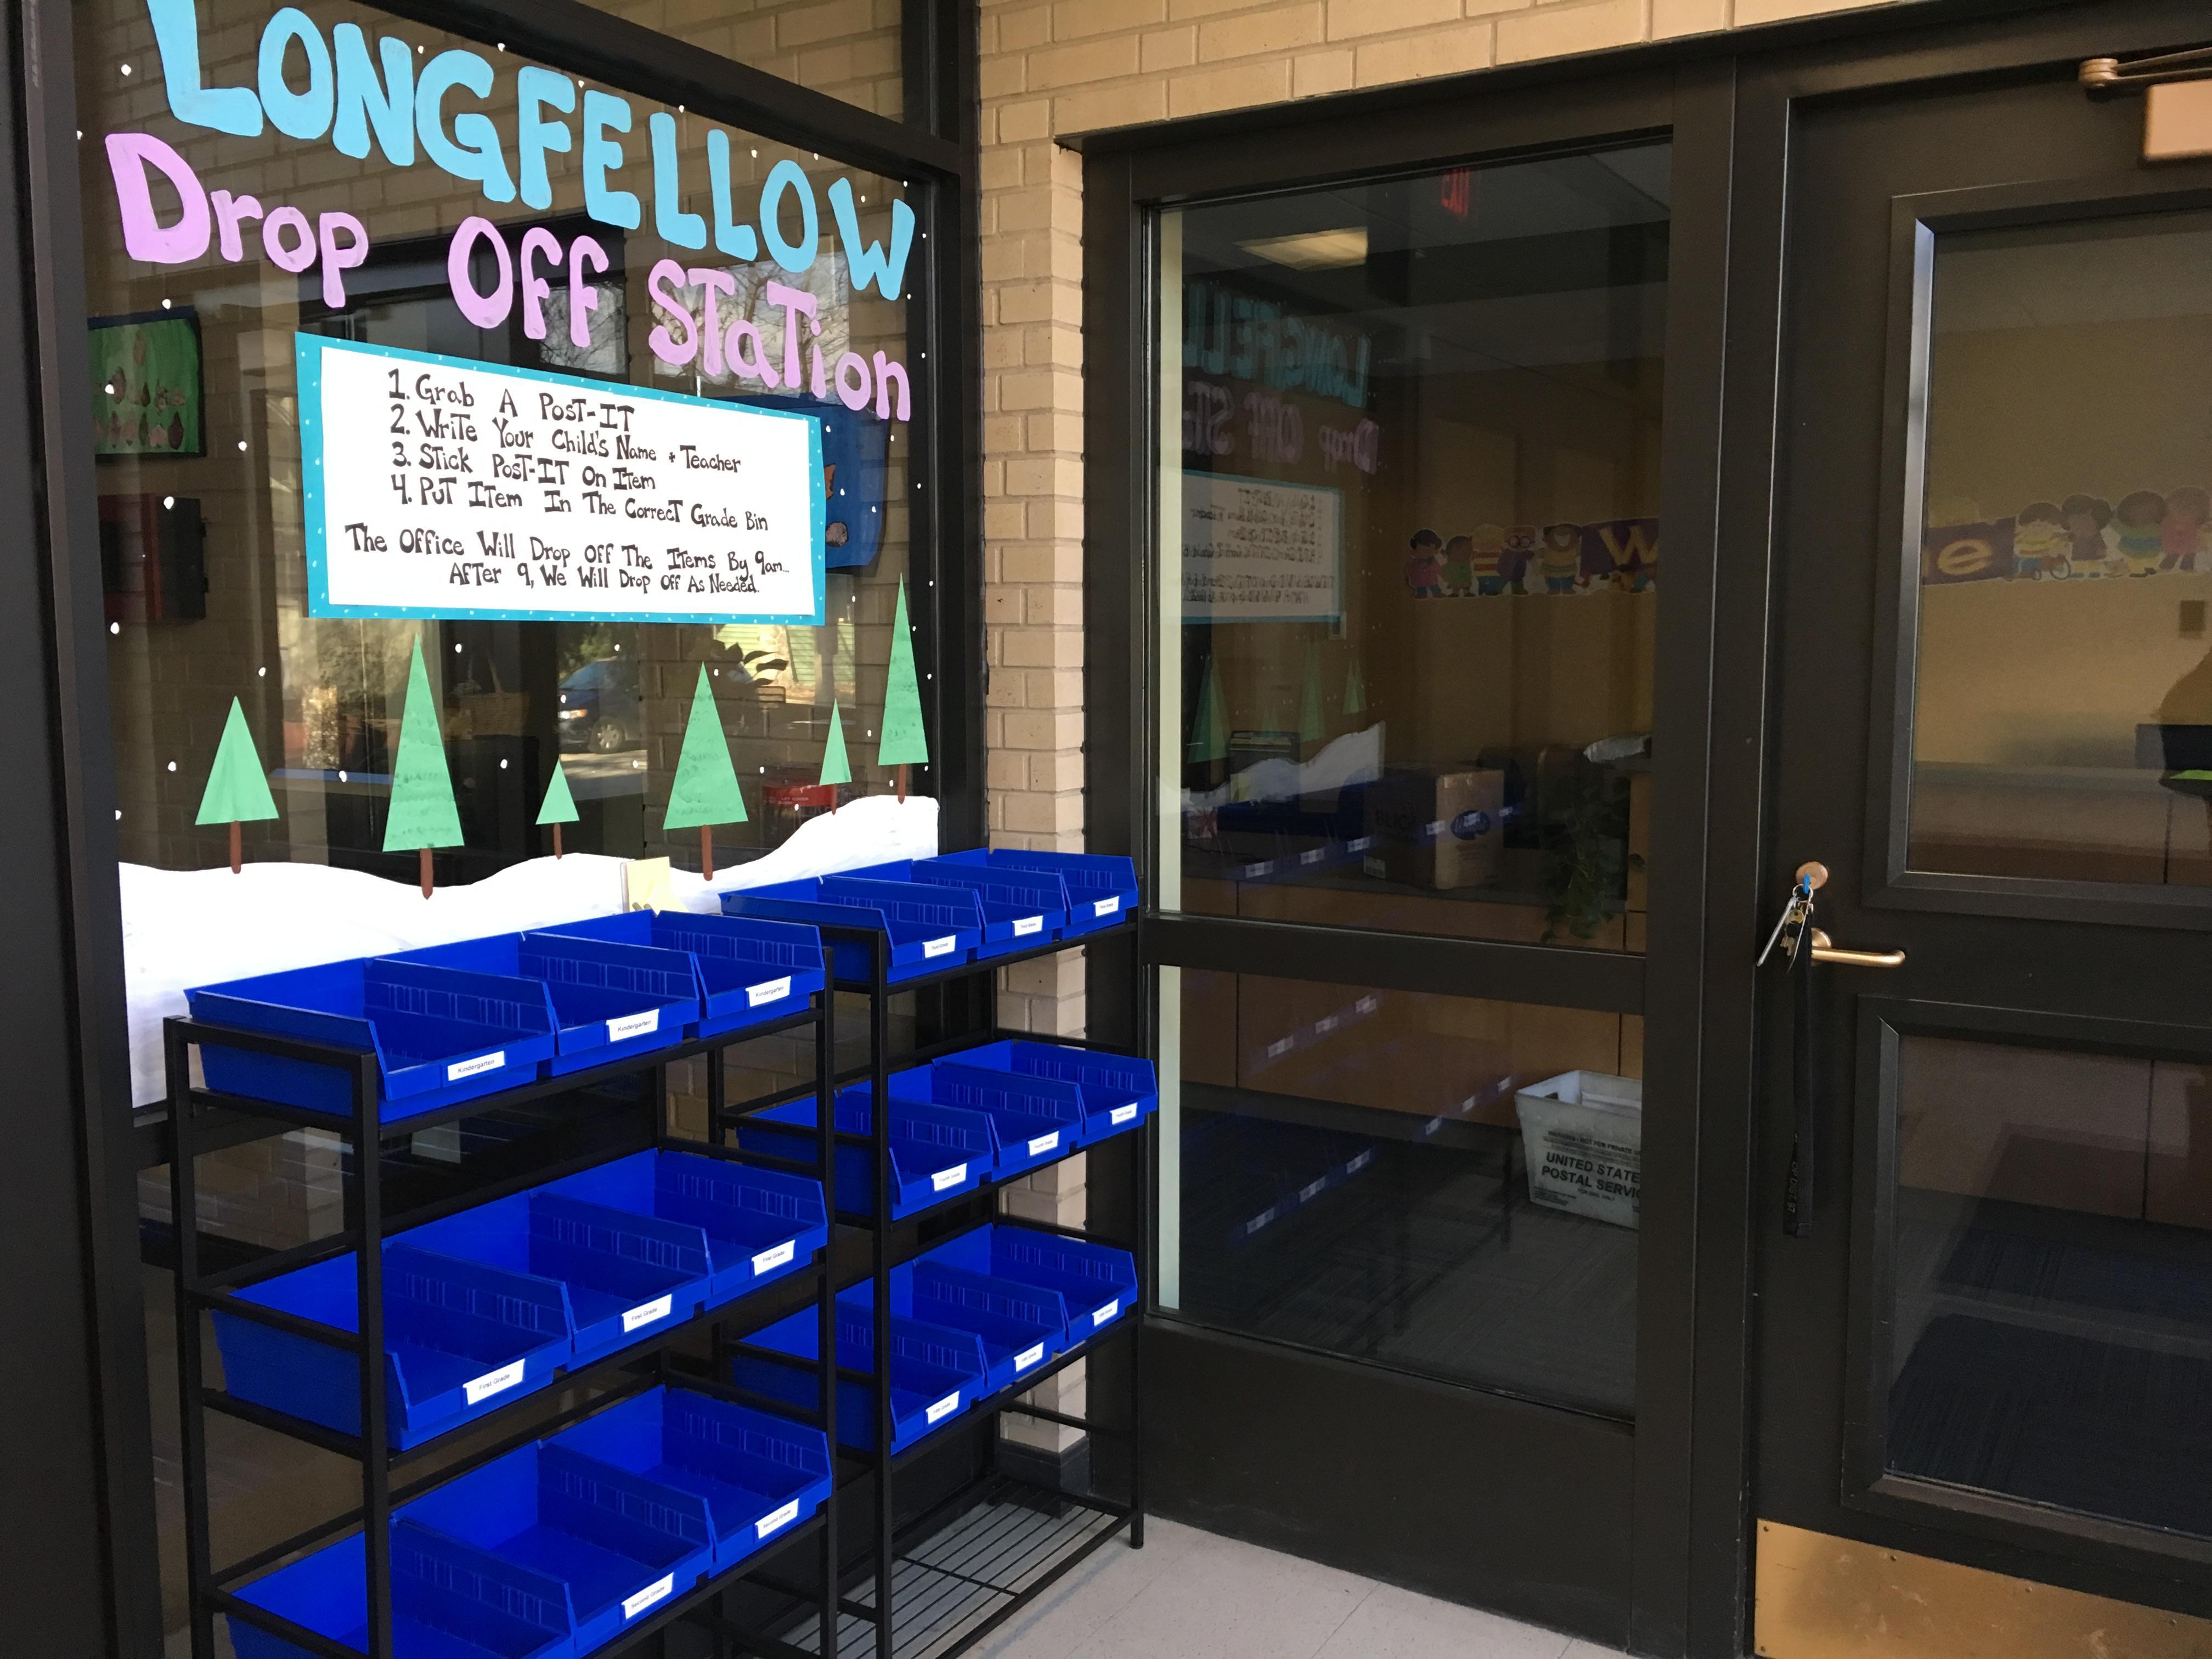 Longfellow drop-off station